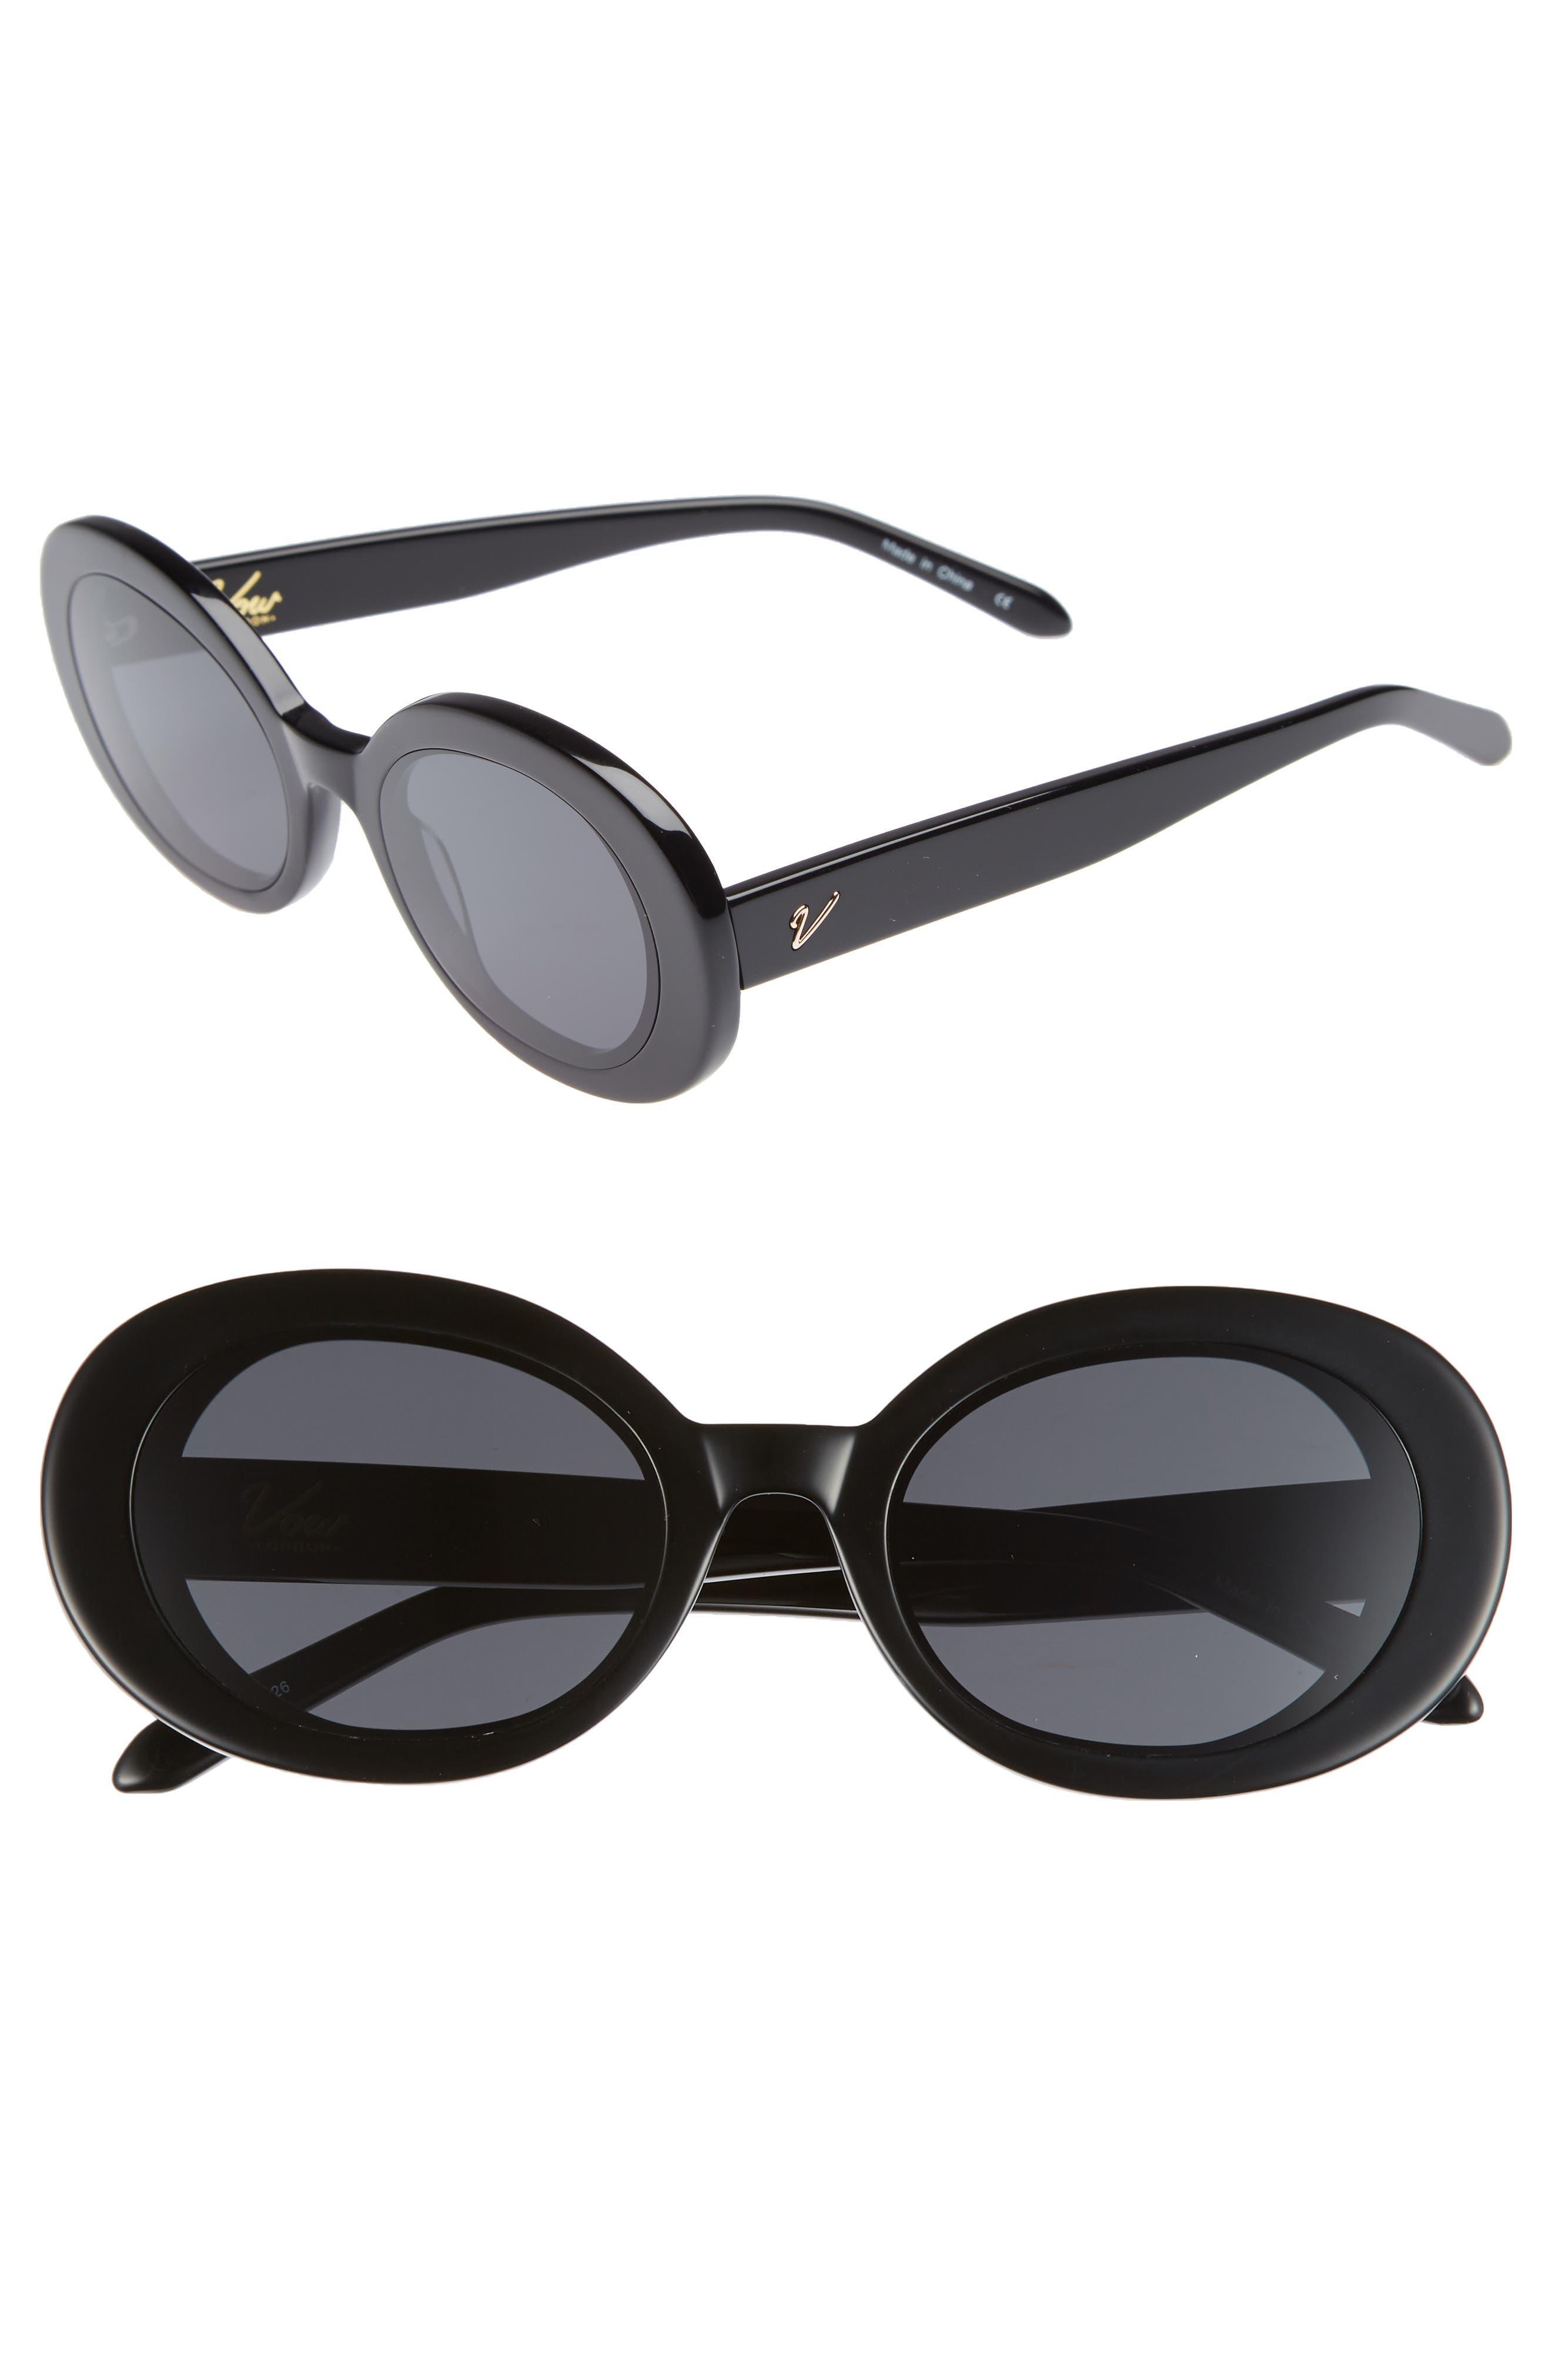 Selena 52mm Oval Sunglasses,                         Main,                         color, BLACK/ SMOKE